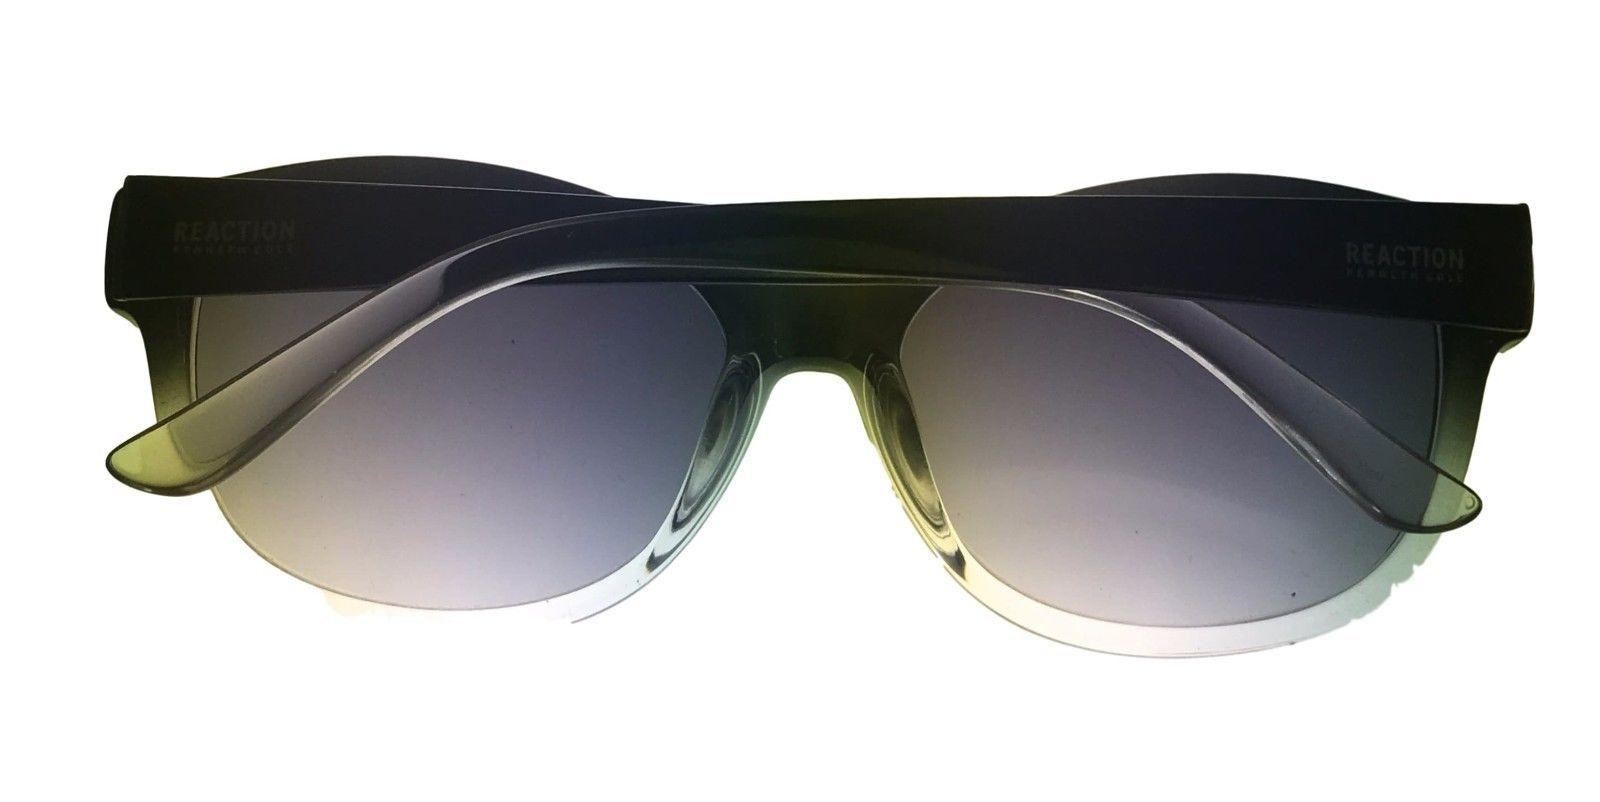 Kenneth Cole Reaction Mens Plastic Sunglass Black Fade, Gradient KC1290 5B image 5